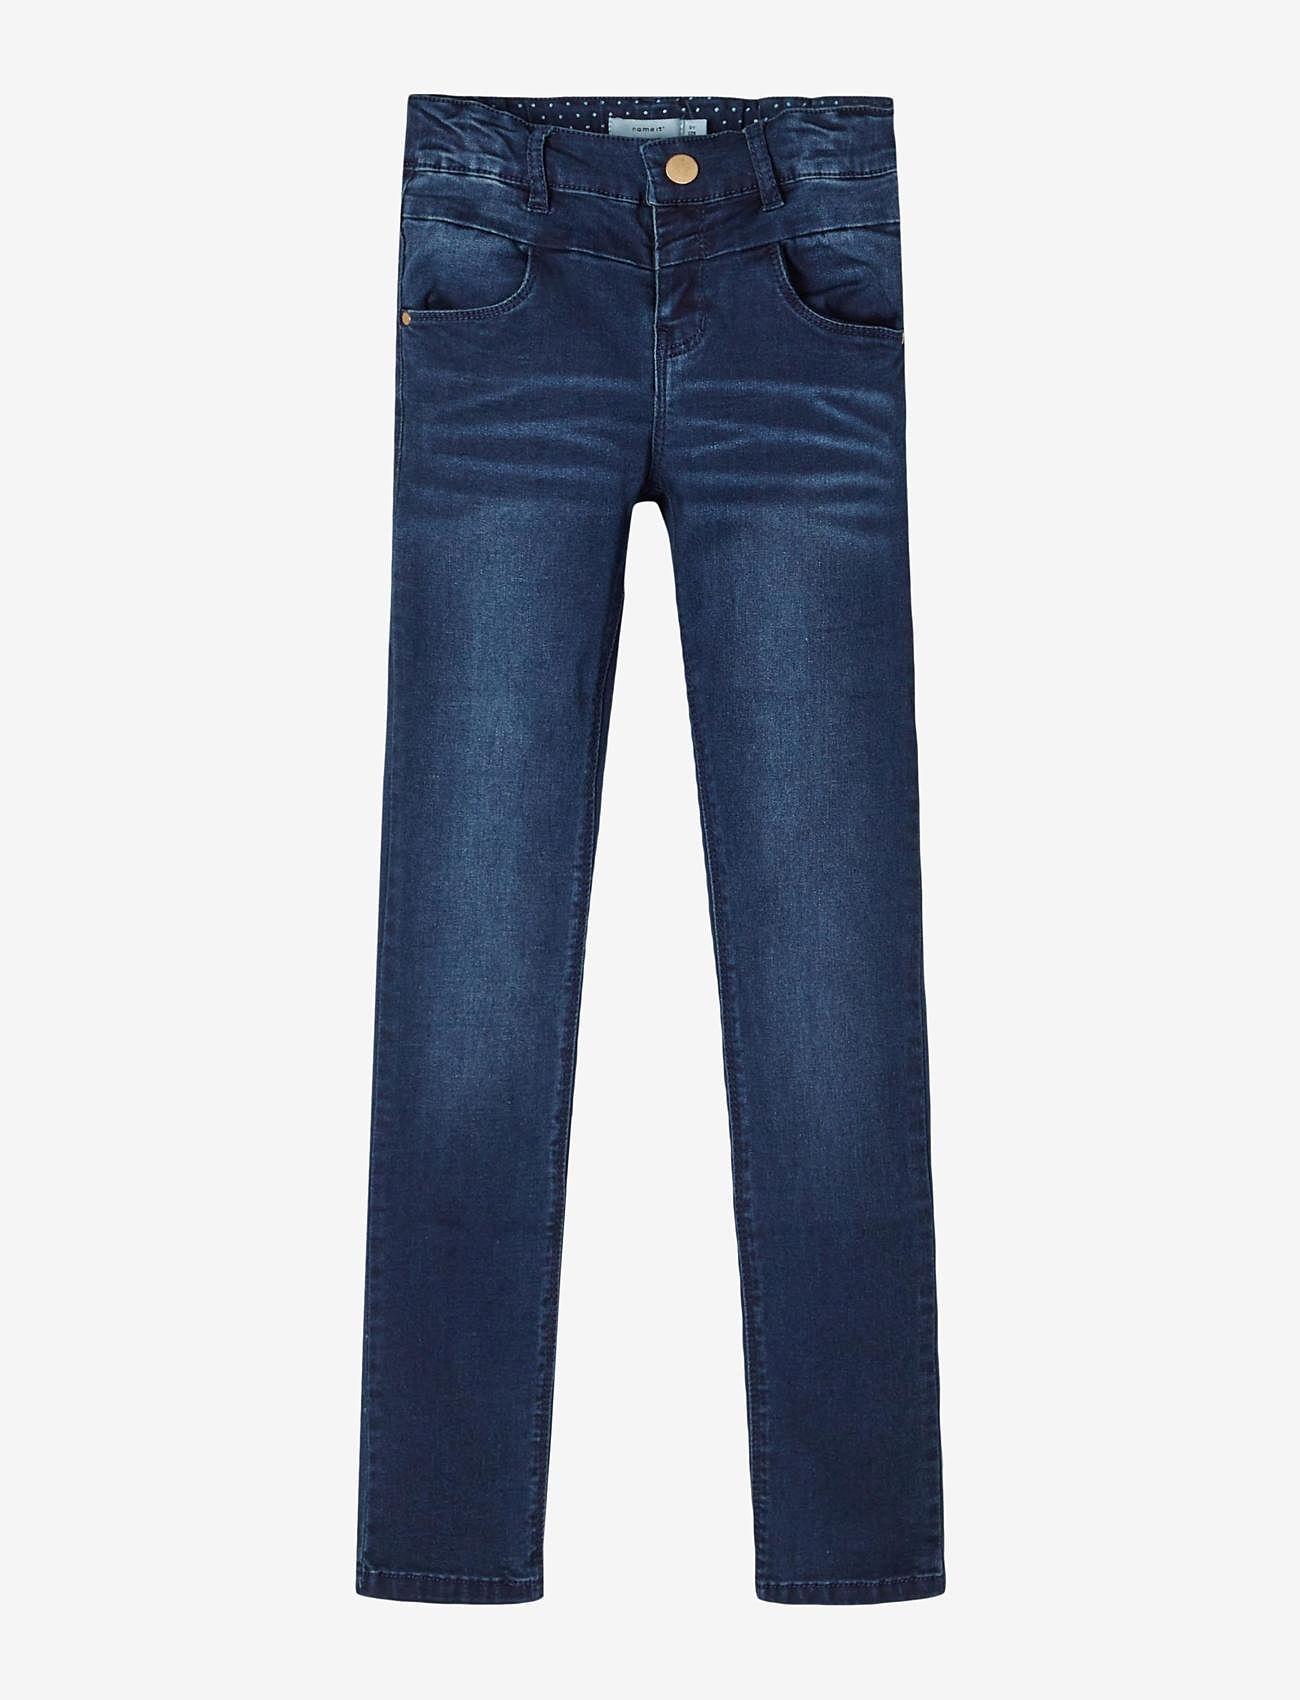 name it - NKFPOLLY DNMTRILLAS 3001 PANT NOOS - jeans - dark blue denim - 0